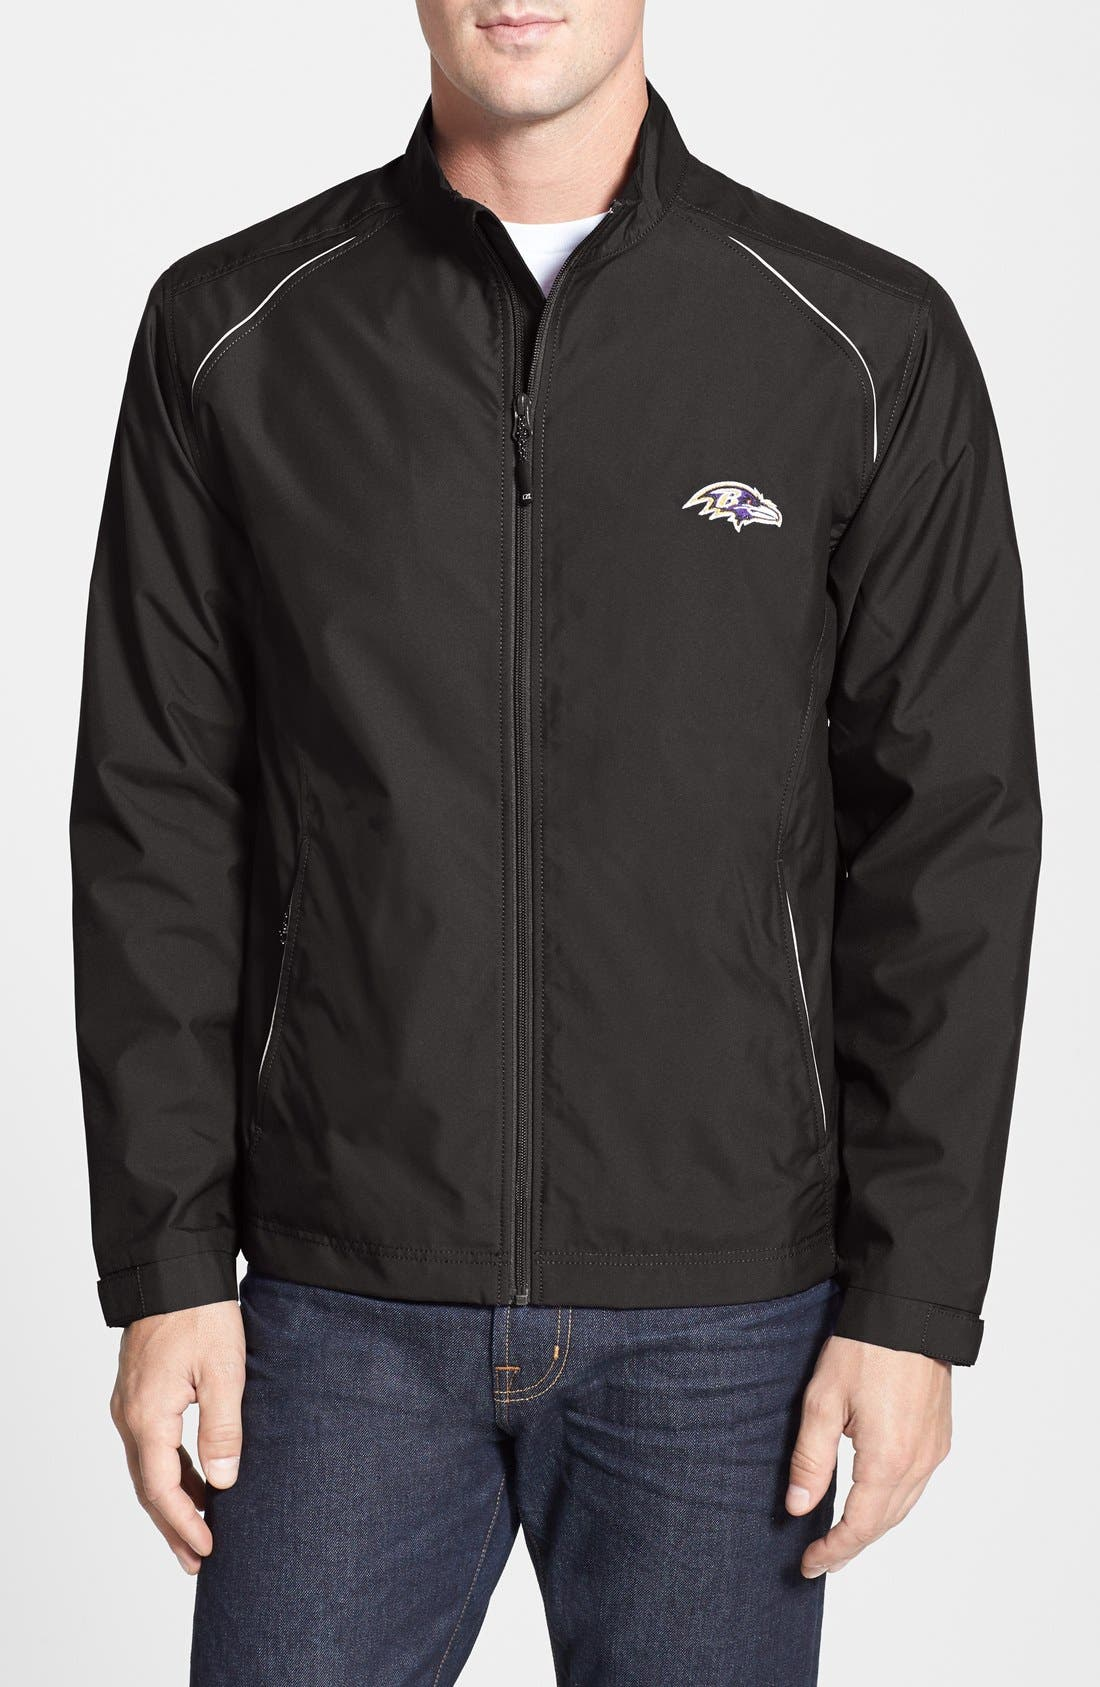 Baltimore Ravens - Beacon WeatherTec Wind & Water Resistant Jacket,                         Main,                         color, 001